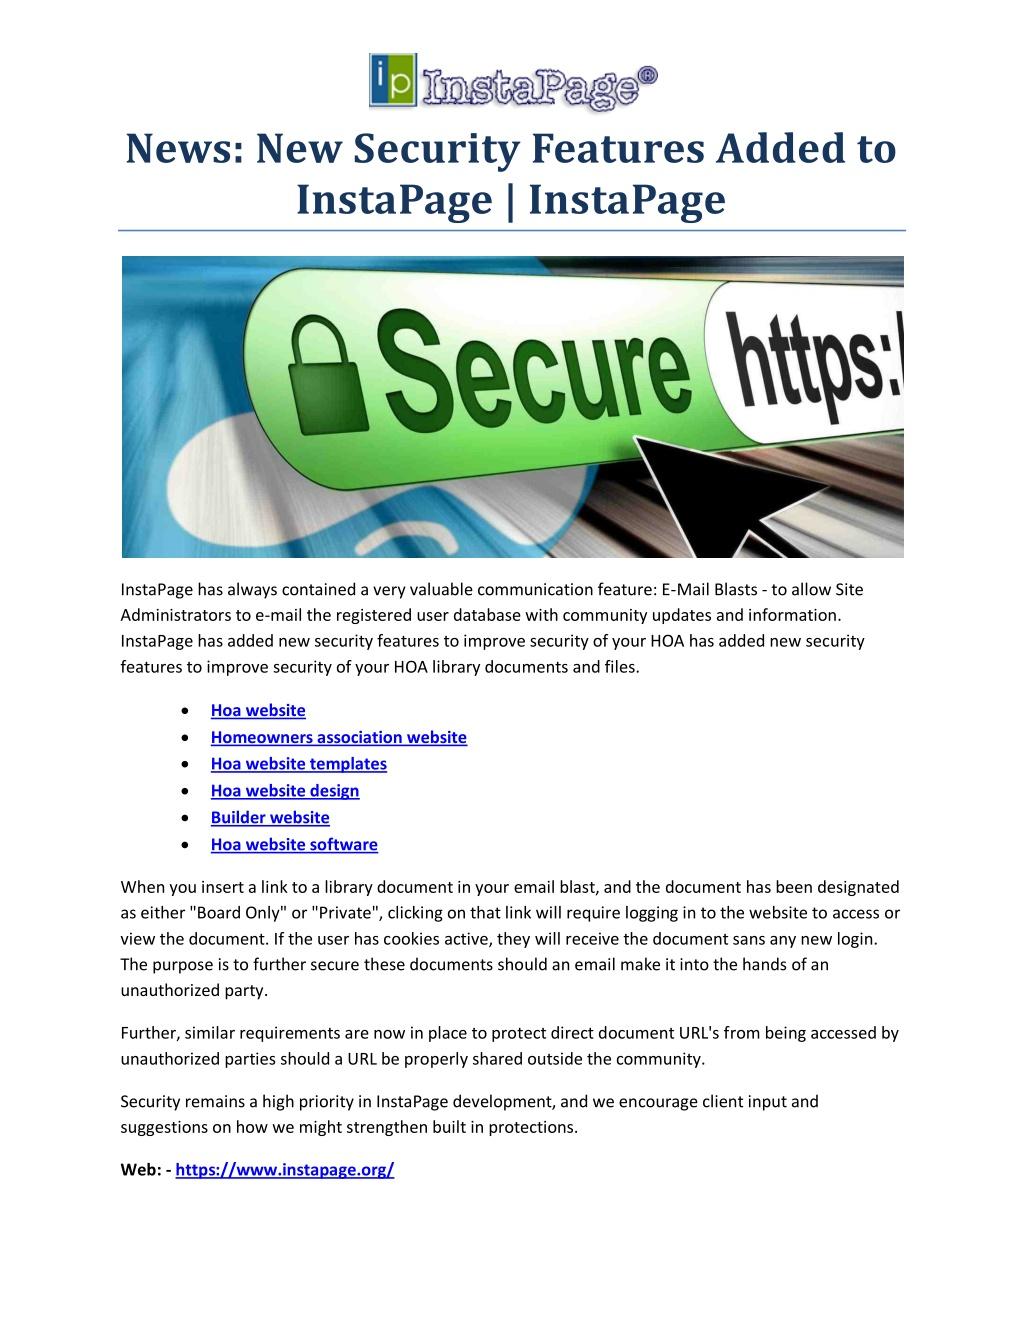 Hoa website design